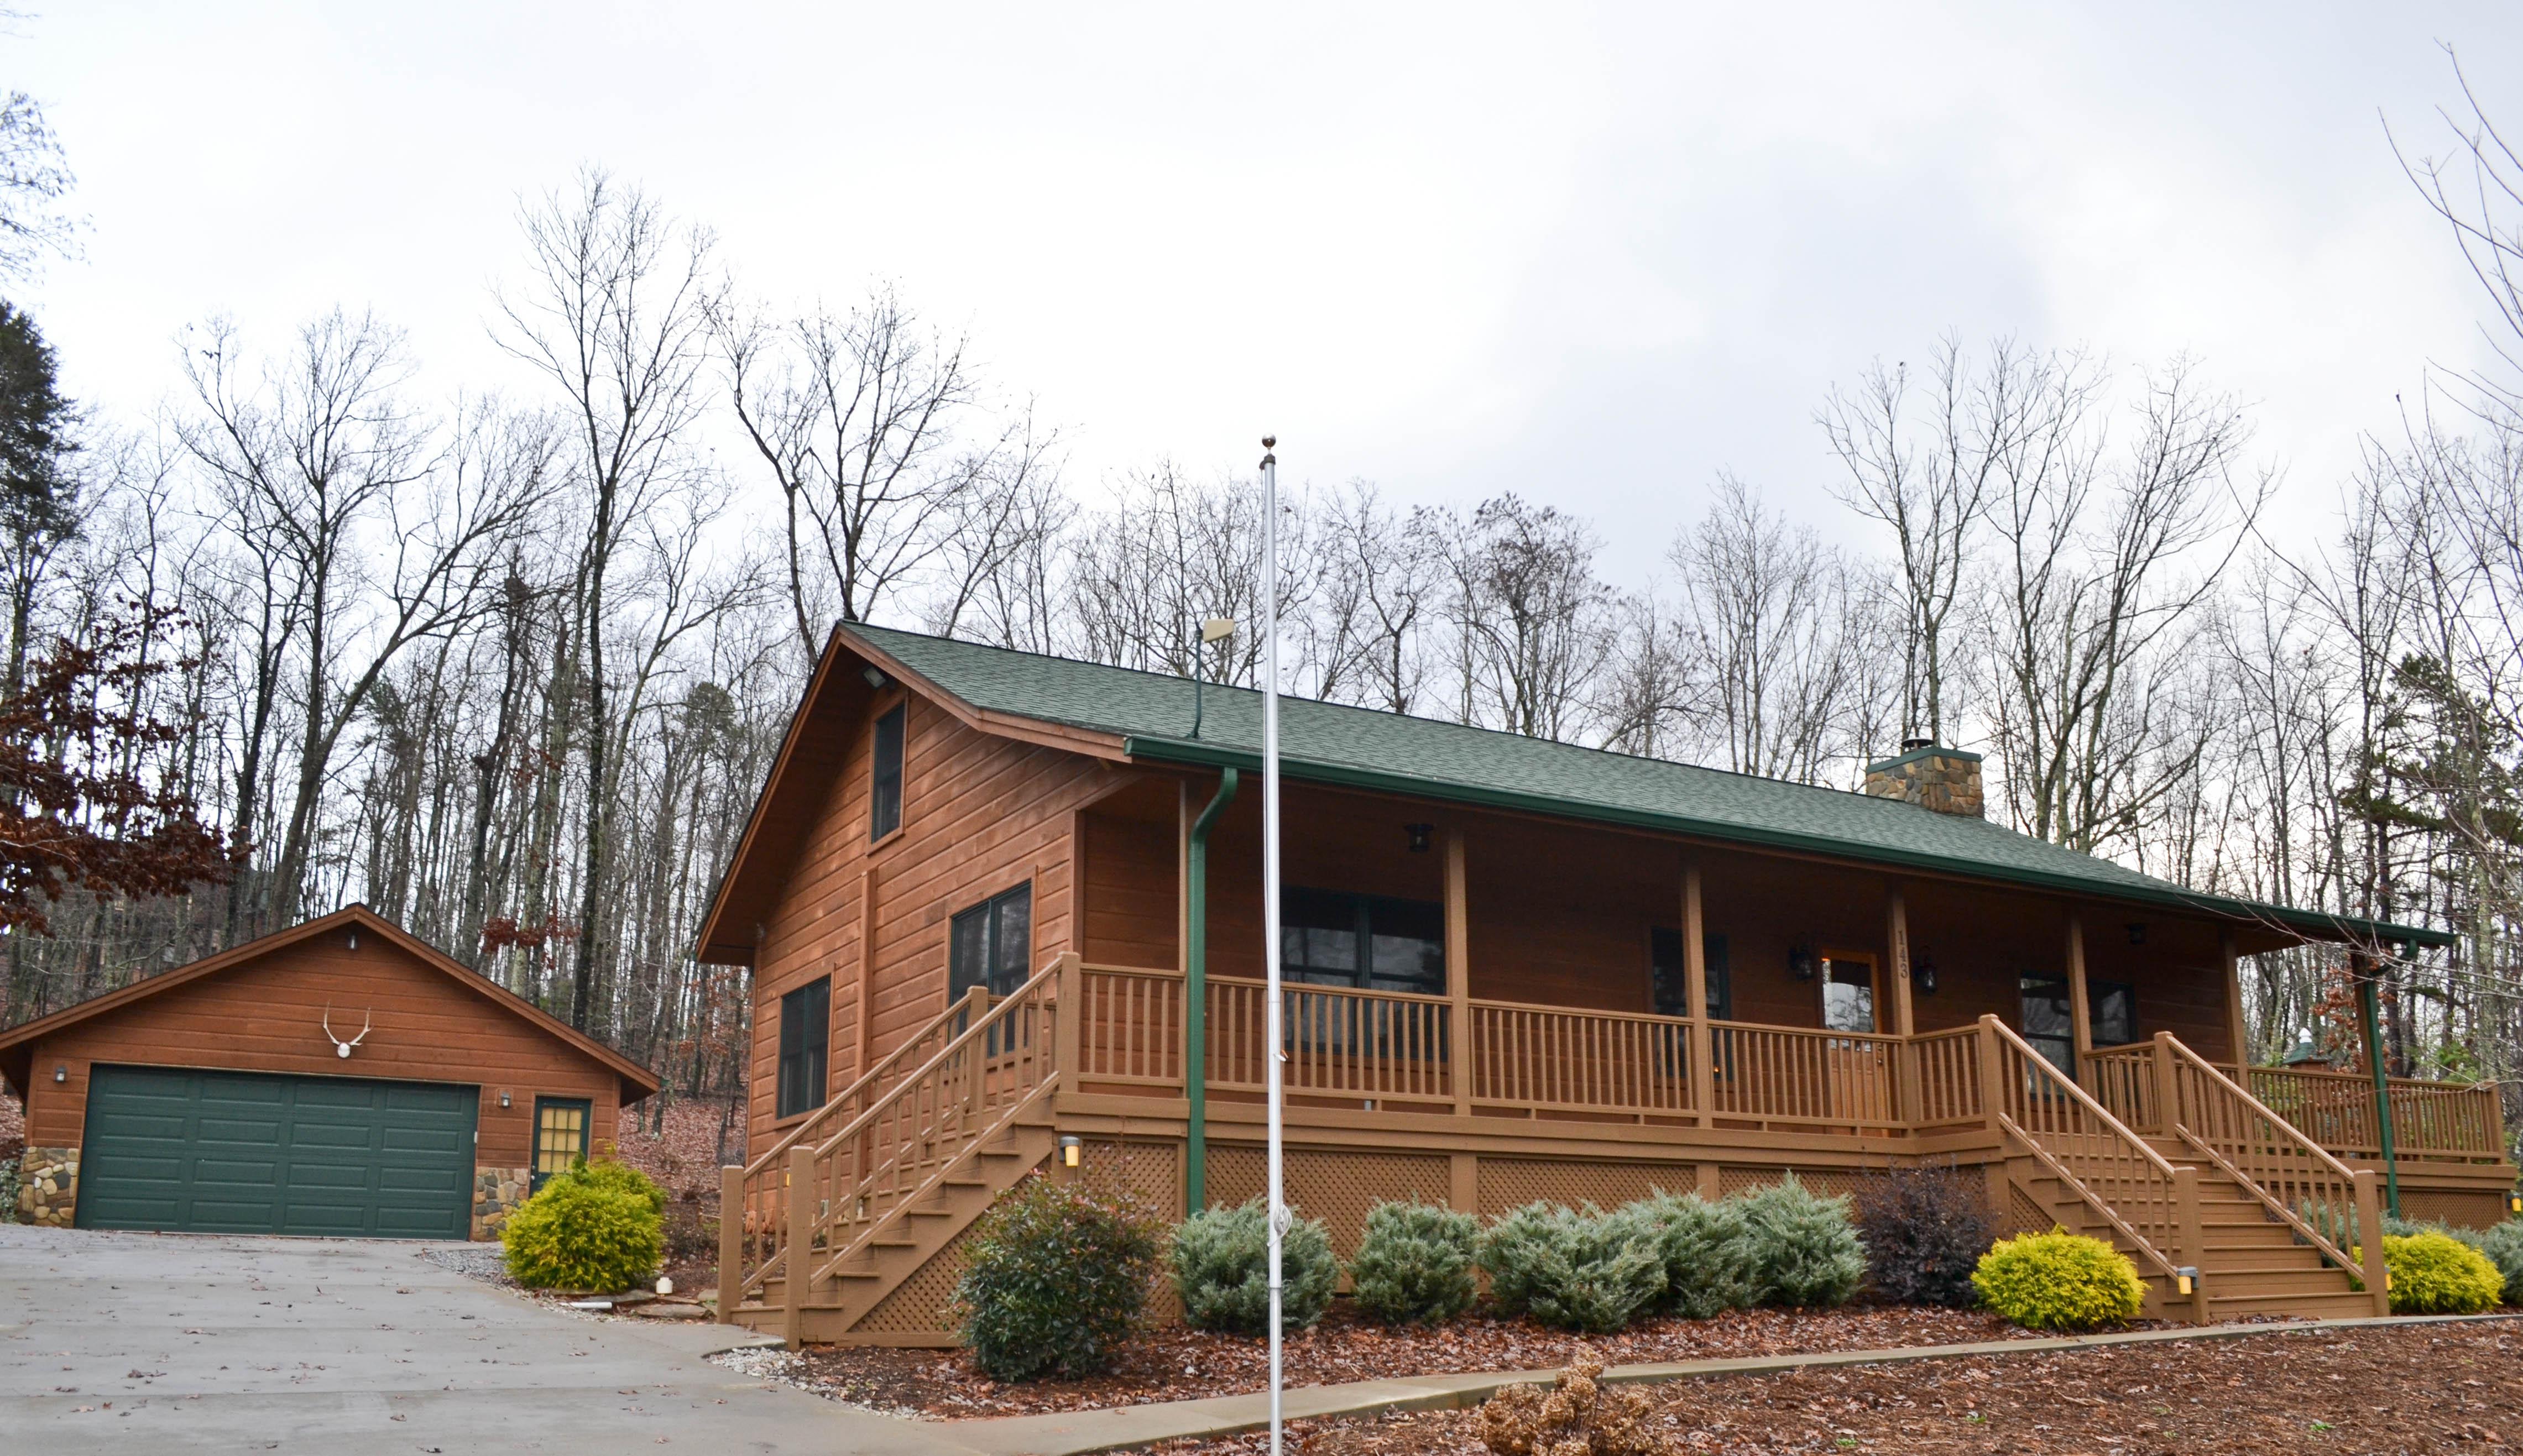 143 Mountain Vista Dr, Nebo, North Carolina 28761